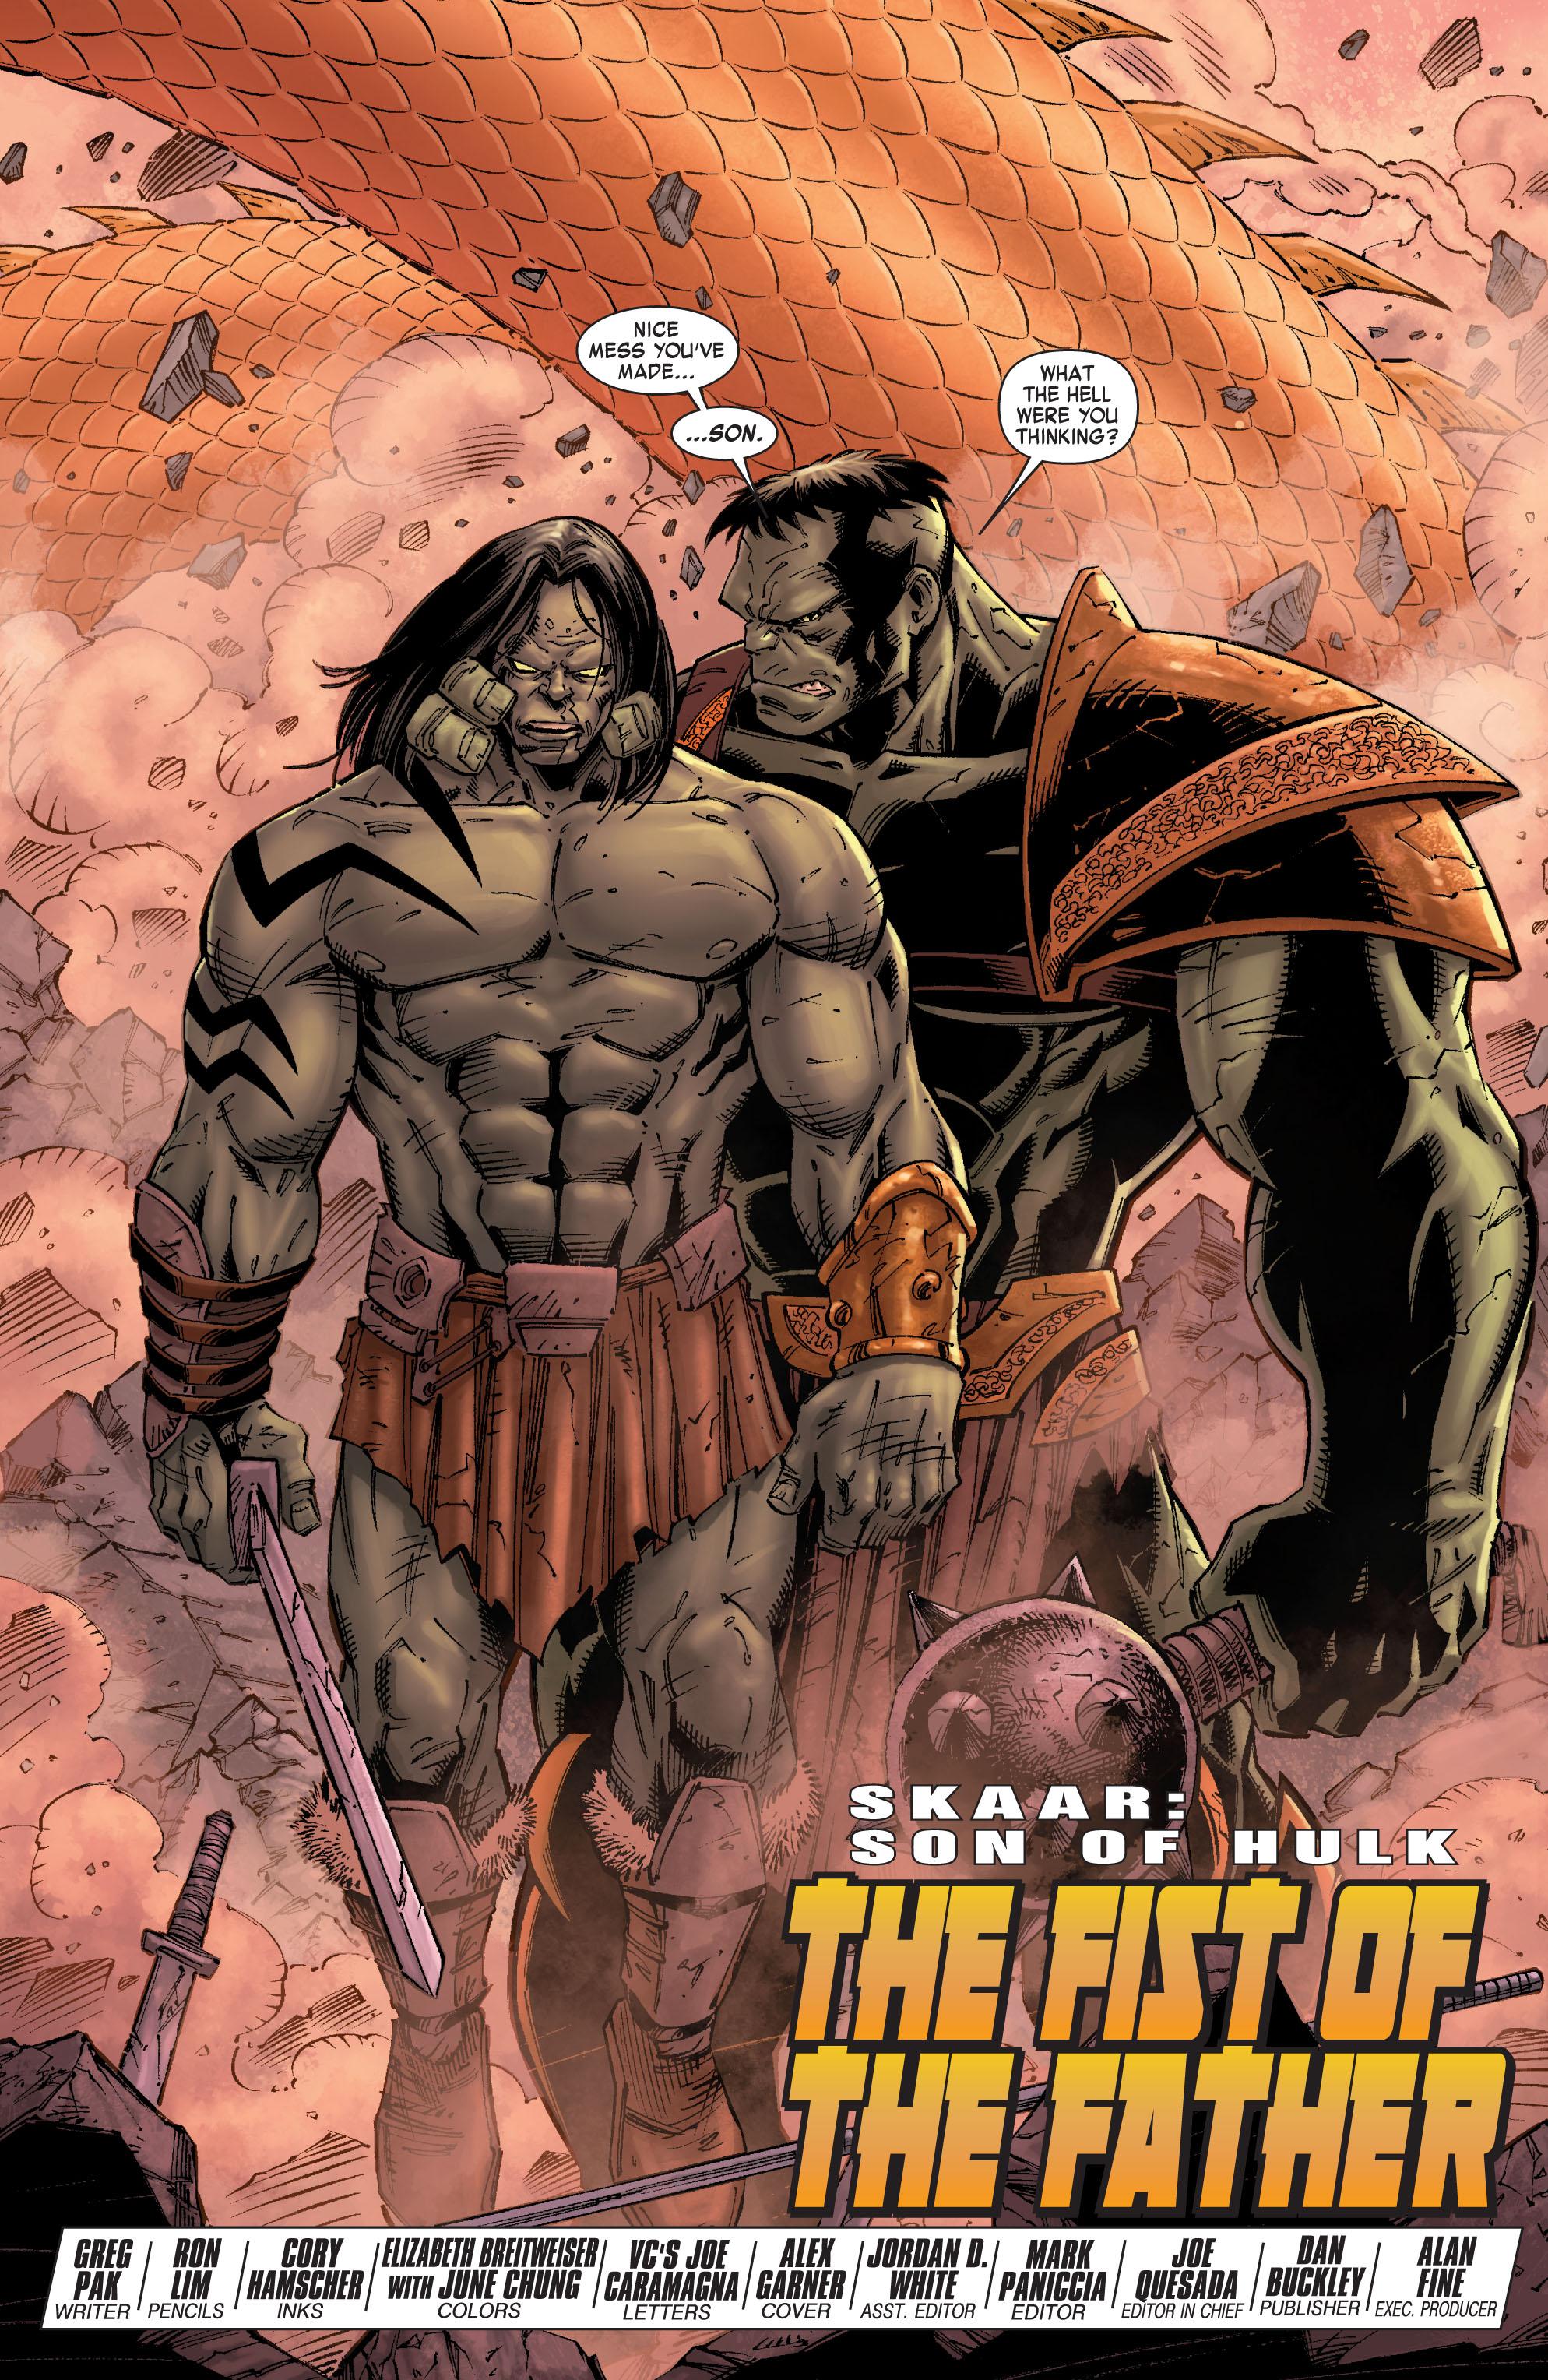 Read online Skaar: Son of Hulk comic -  Issue #9 - 5